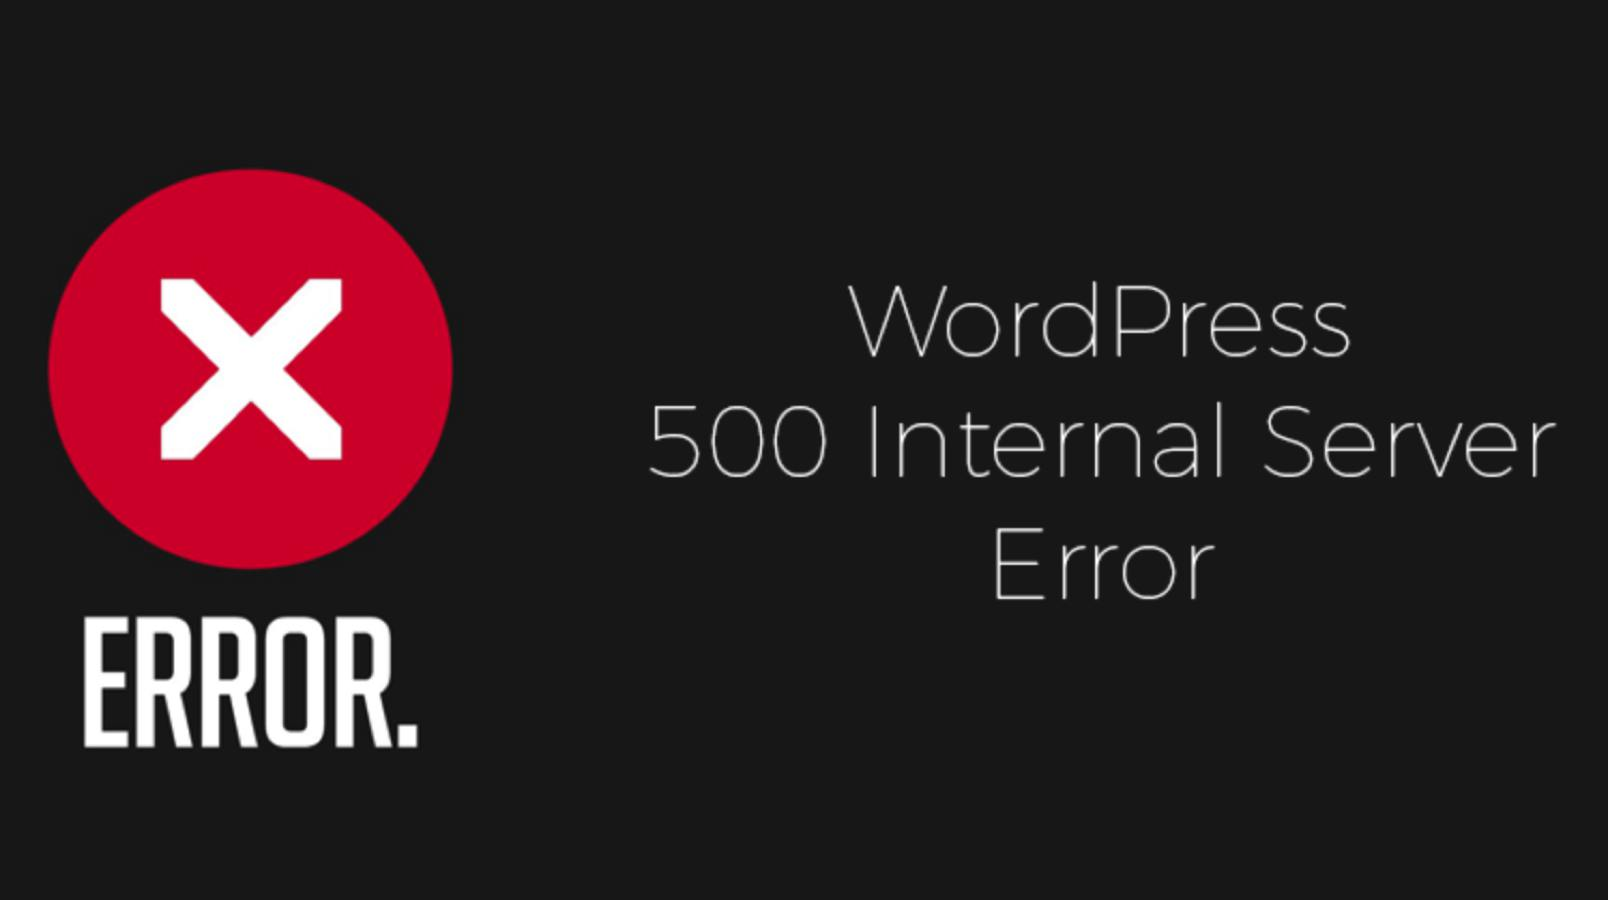 wordpress 500 internal server error